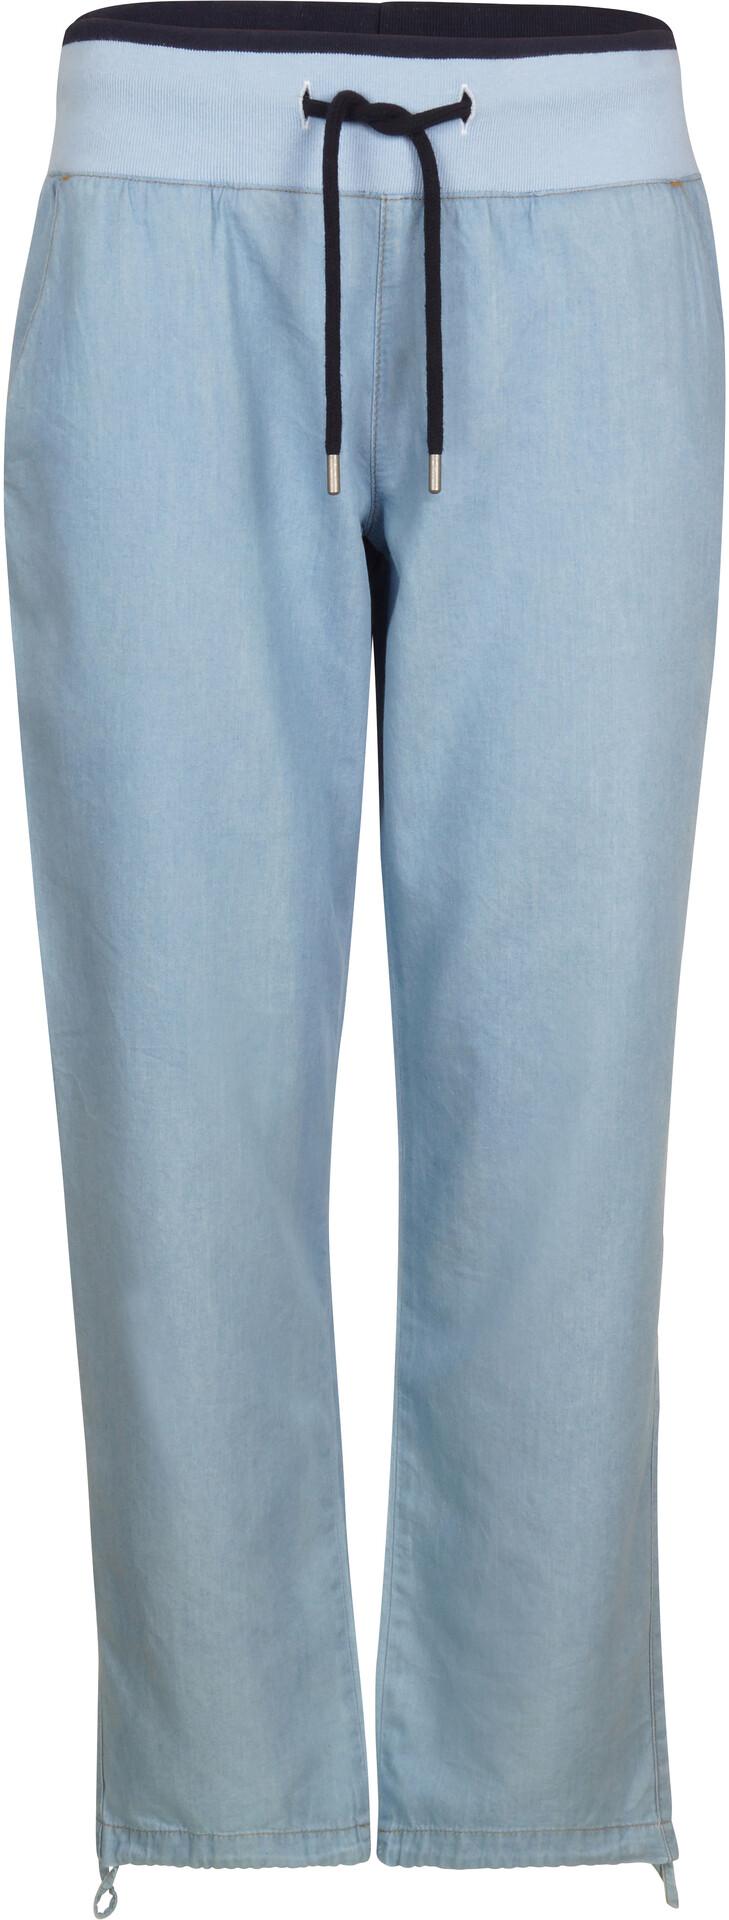 Elkline Bleu Pantalon Femme Blaue Lagune 13JFcTKl